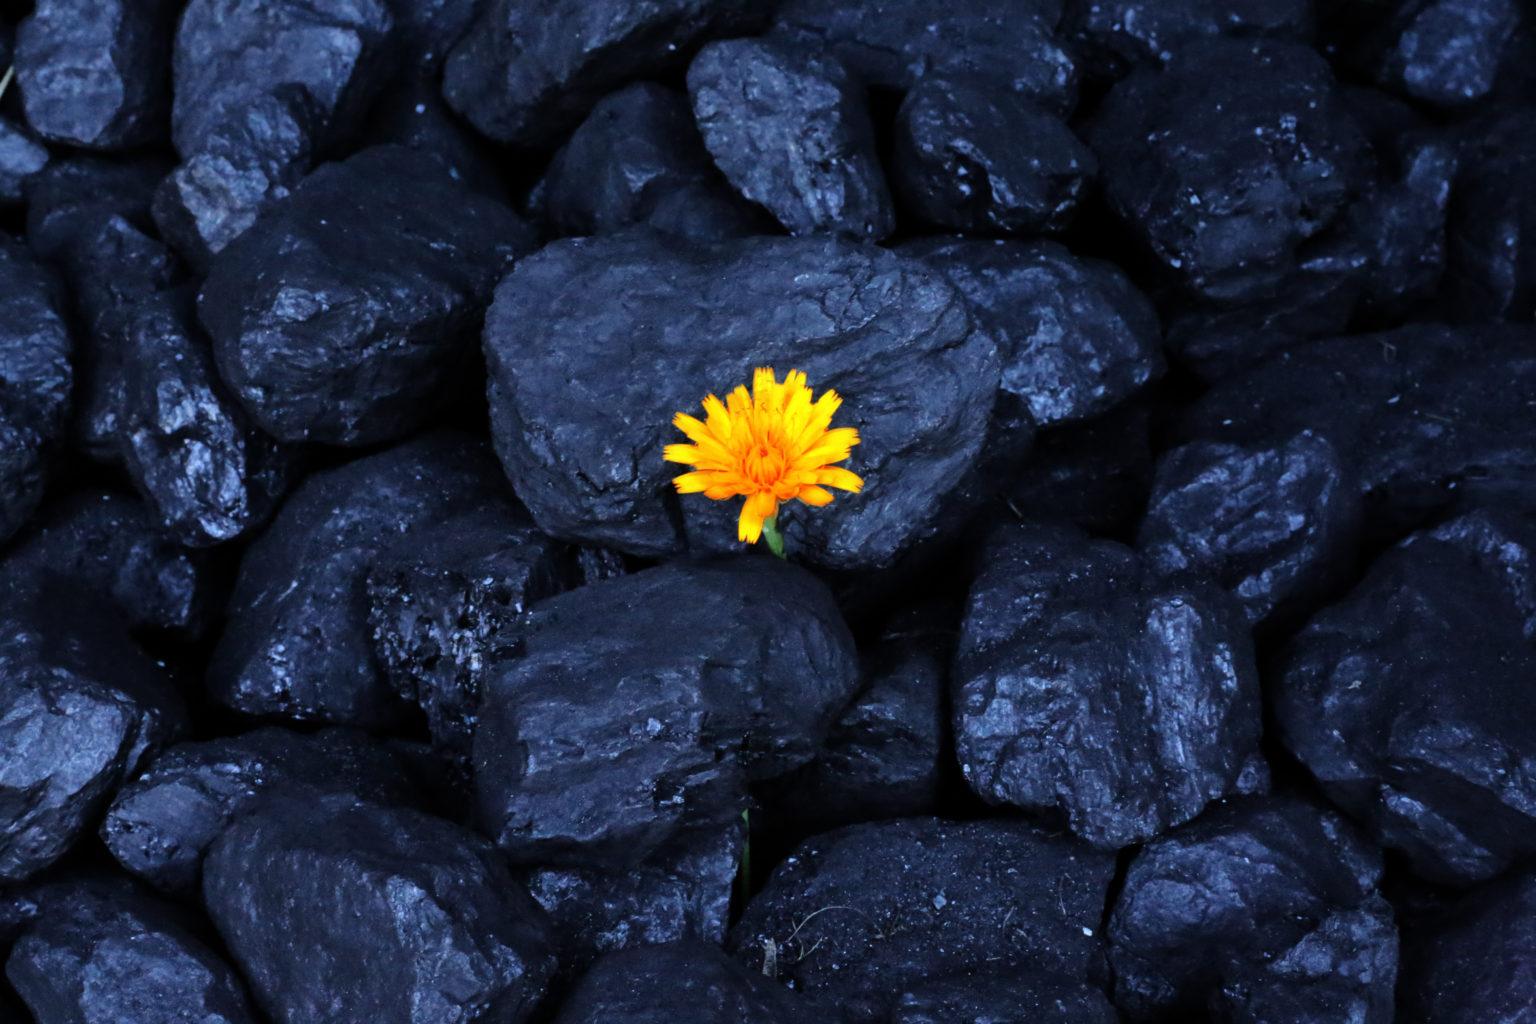 flower-coal-yellow-fuel-carbon-dioxide-organic-1418551-pxhere.com